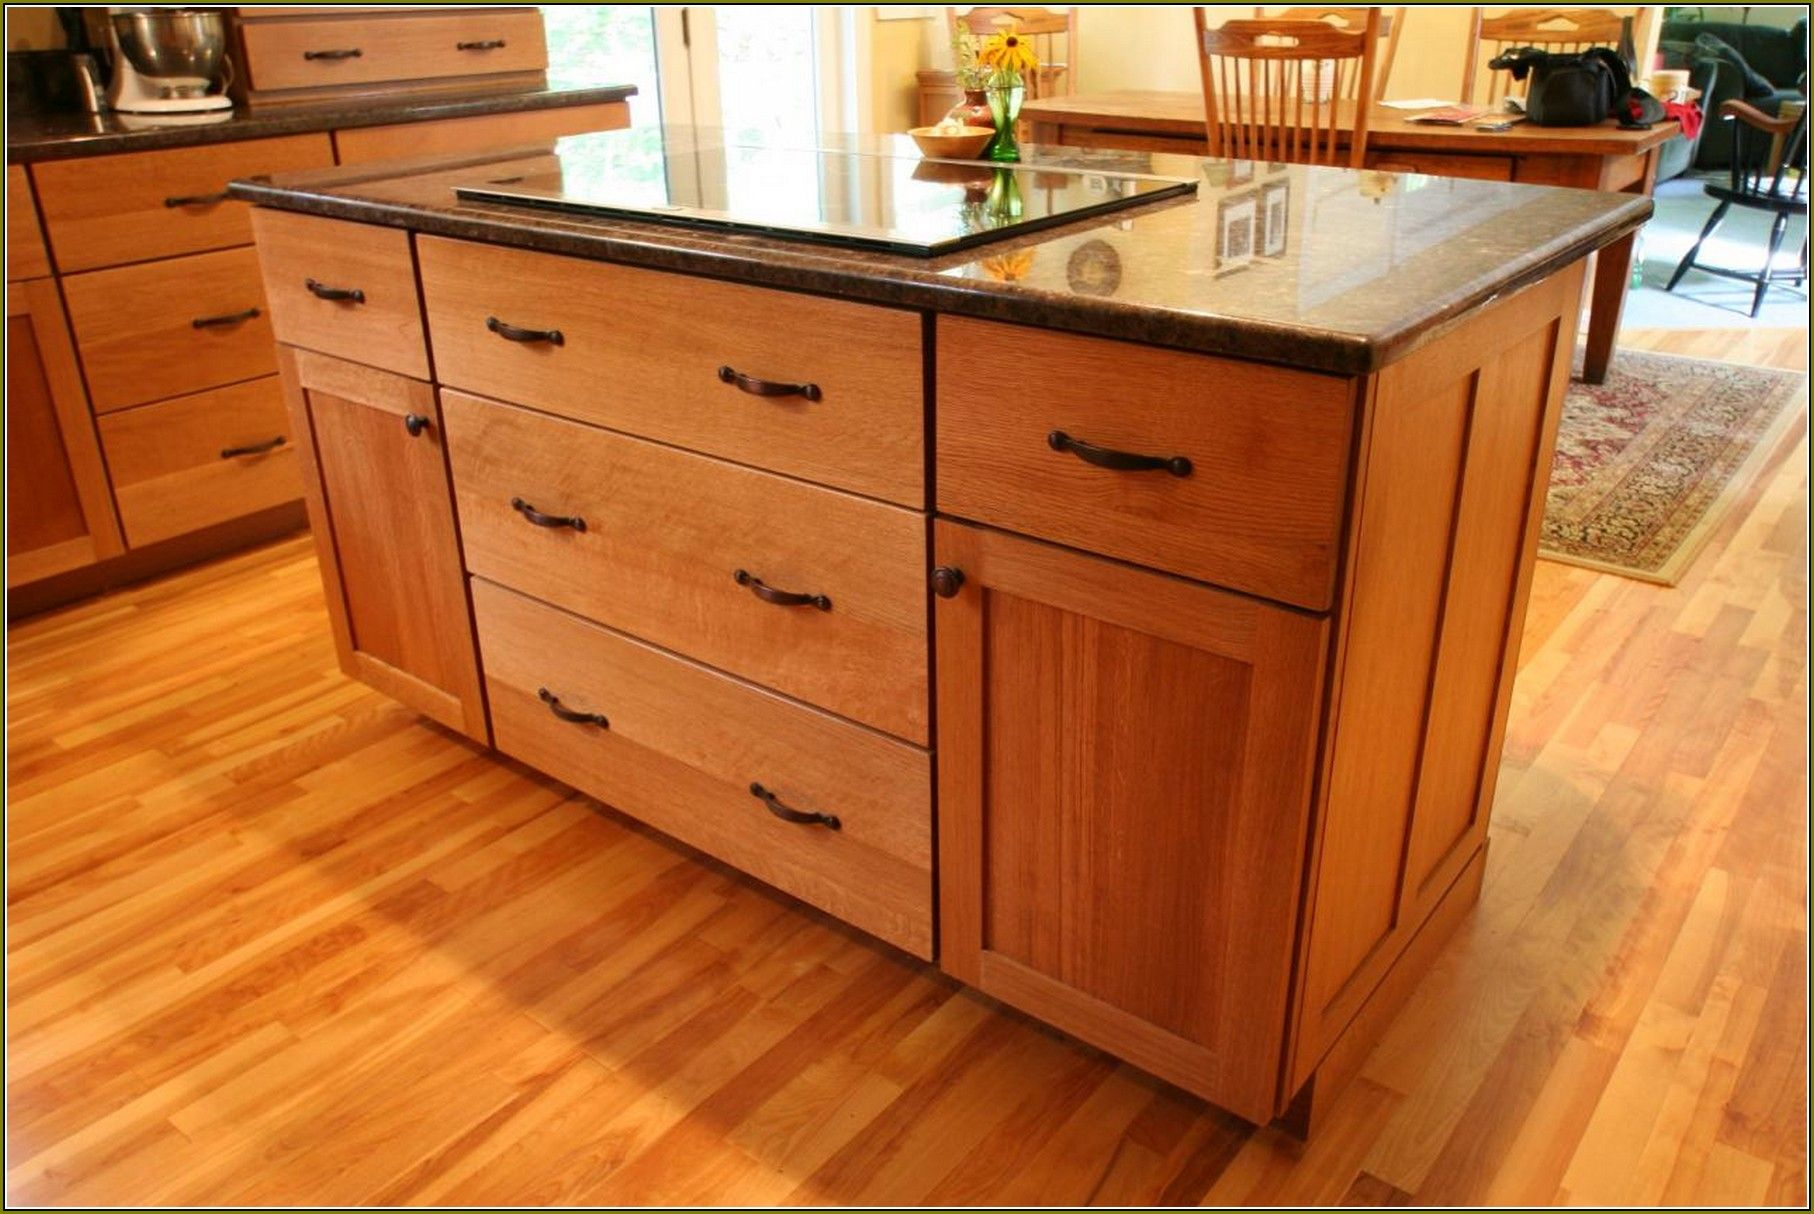 Honey Oak Cabinets What Color Granite   Kitchen decor ...